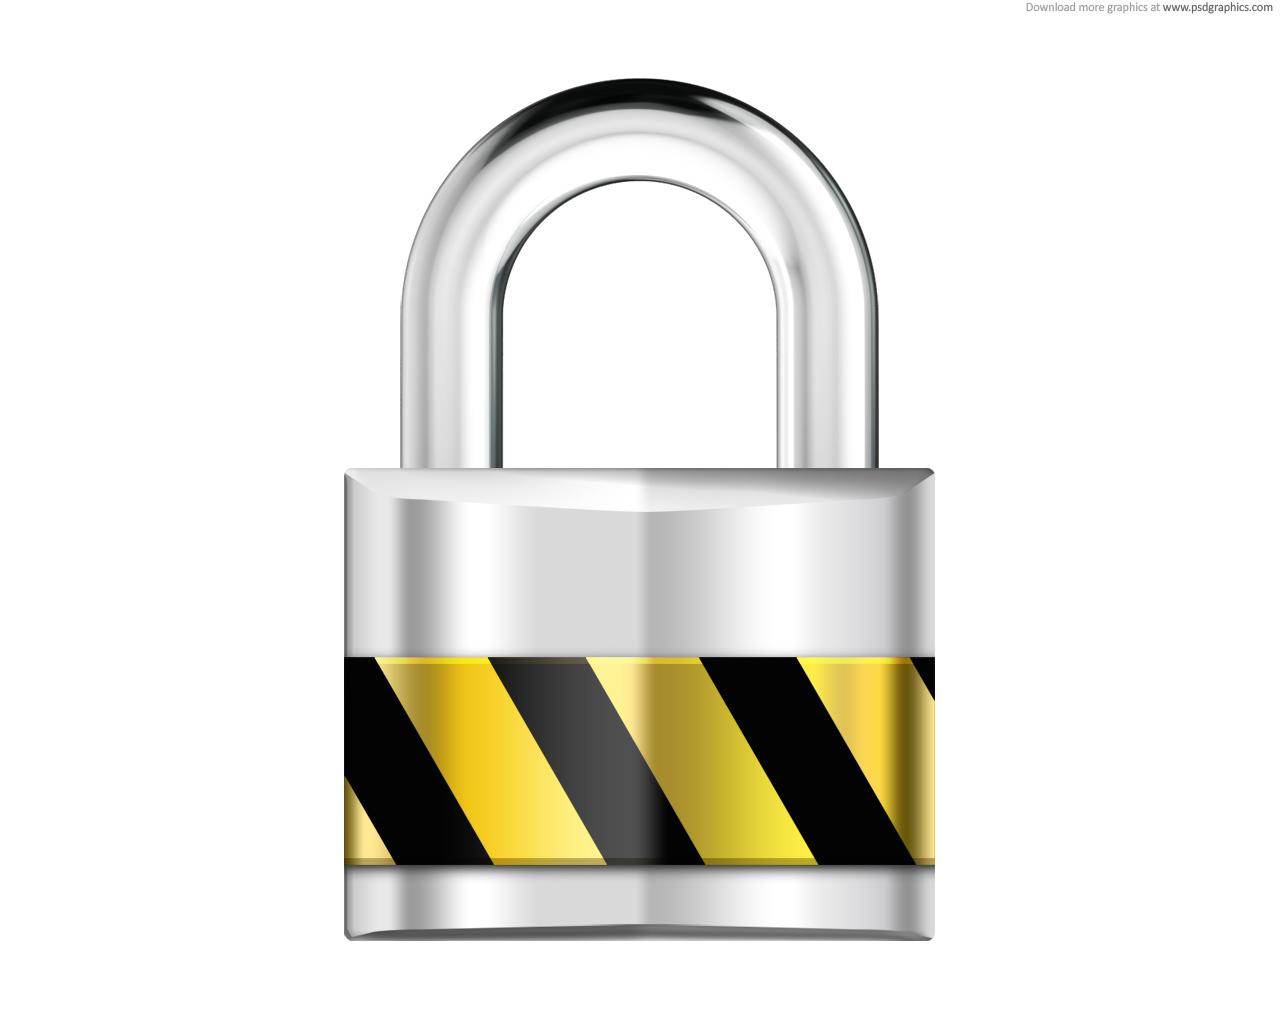 Icon Hd Lock #29047.